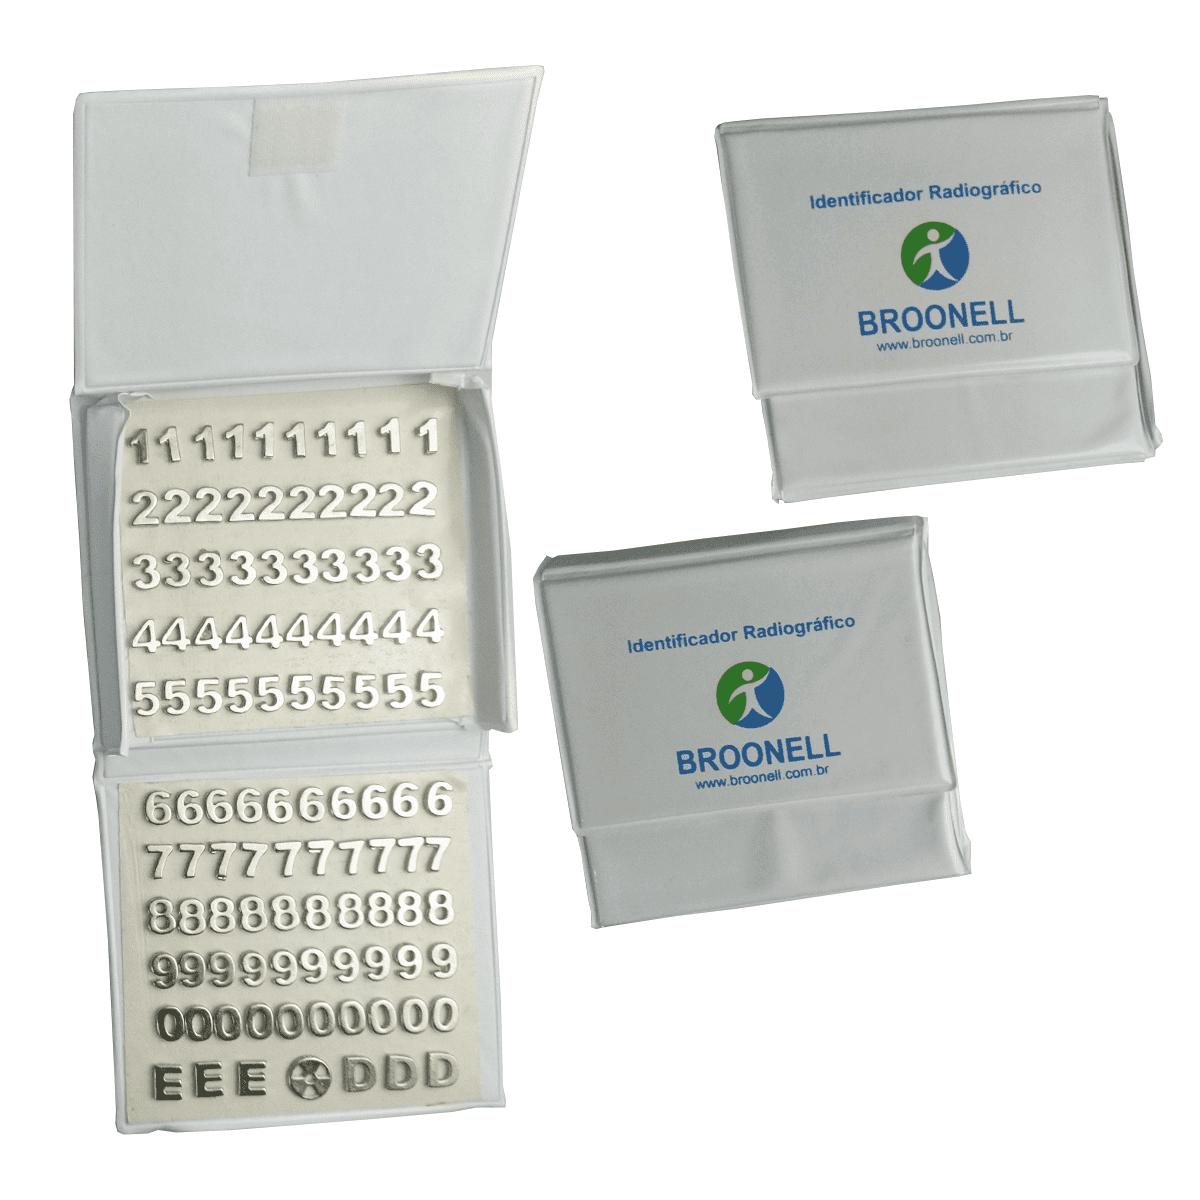 Numerador para radiologia niquelado 9mm